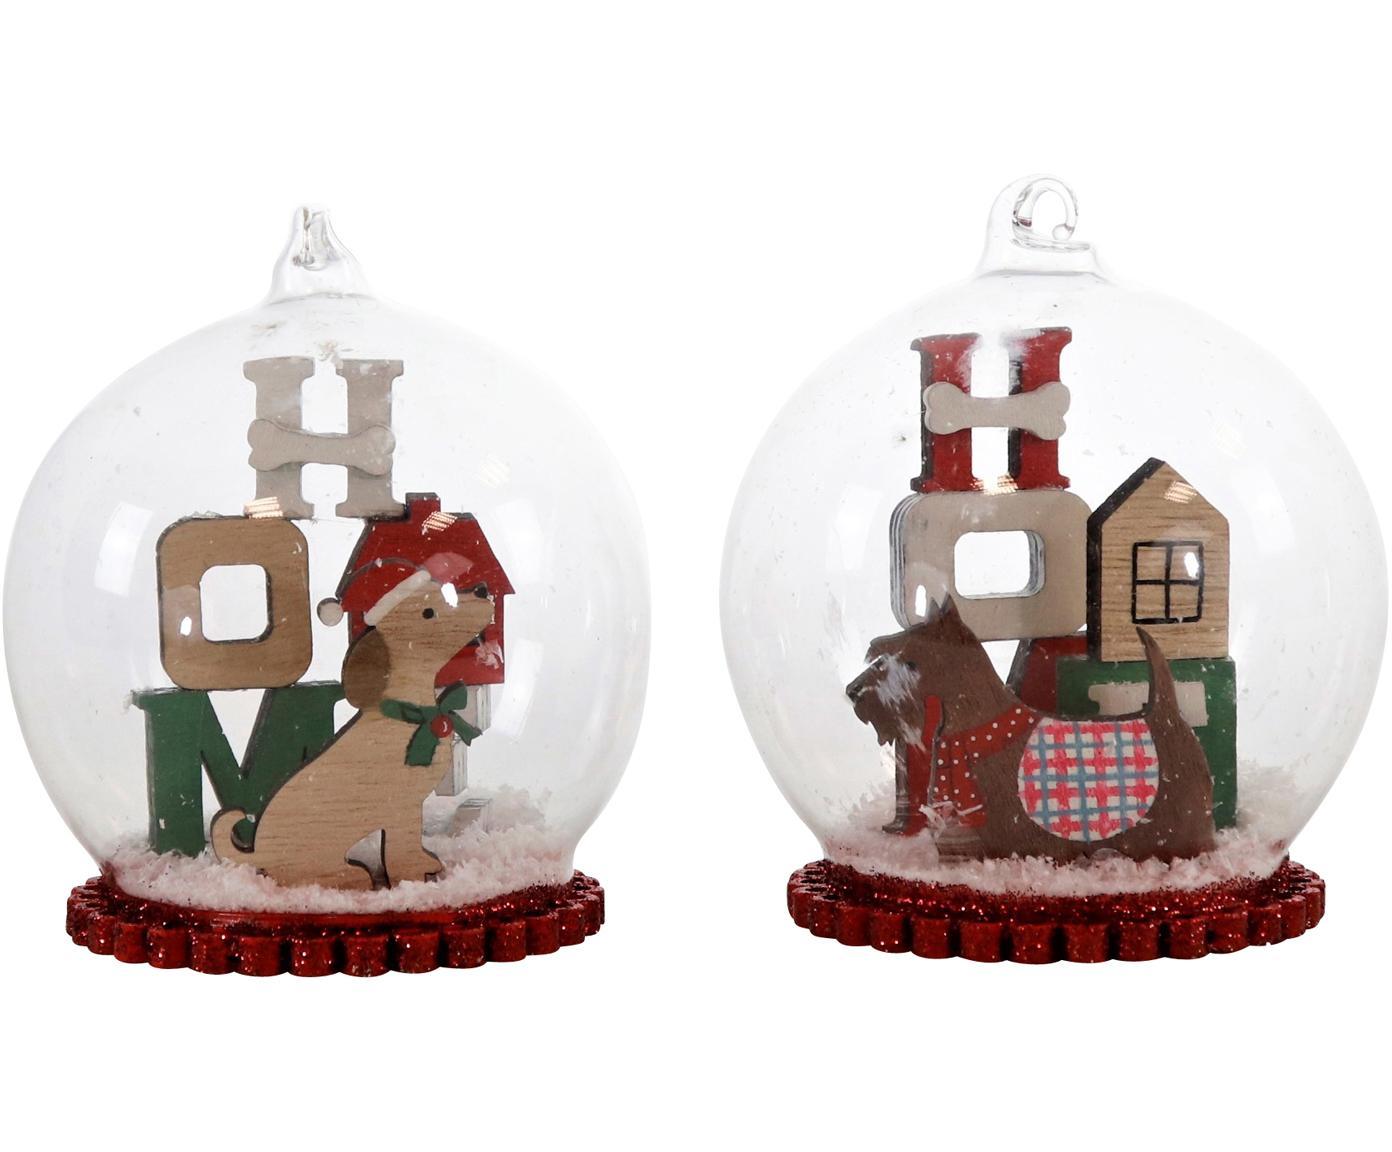 Glaskugeln-Set Christmas Dogs, 2-tlg., Glas, Holz, Styropor, Mehrfarbig, Ø 8 x H 11 cm